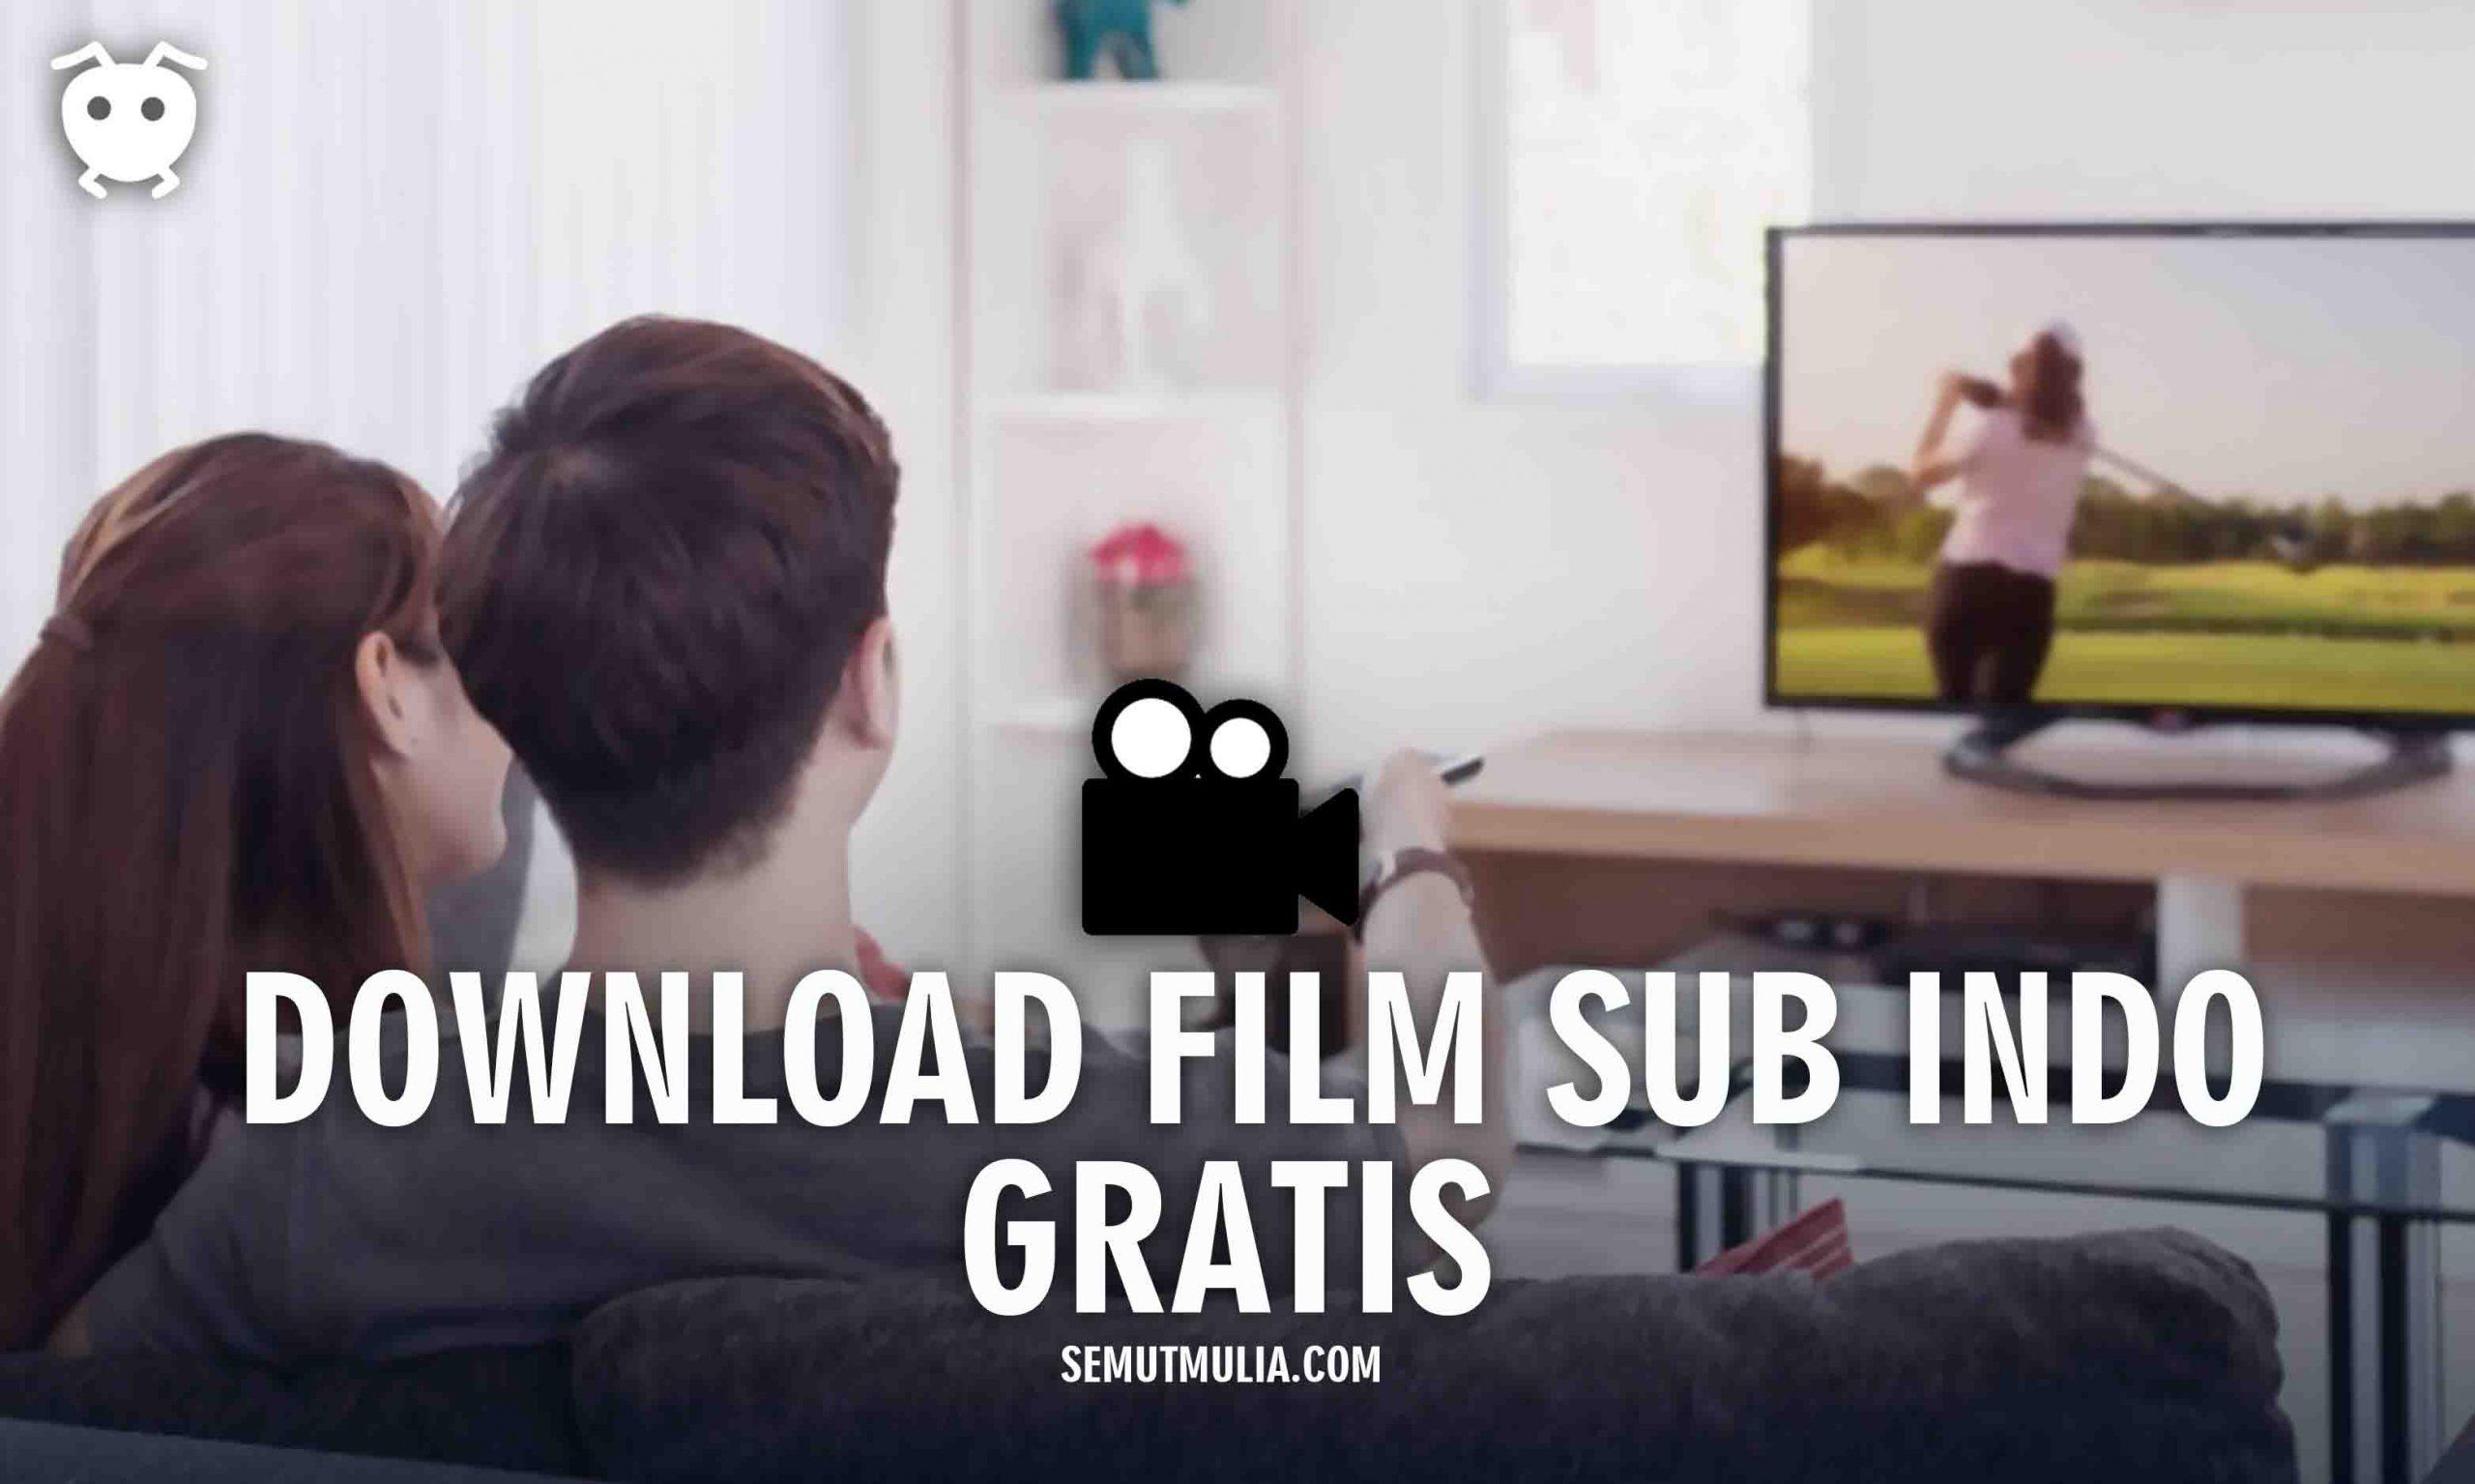 Download Film Sub Indo Gratis Terbaik